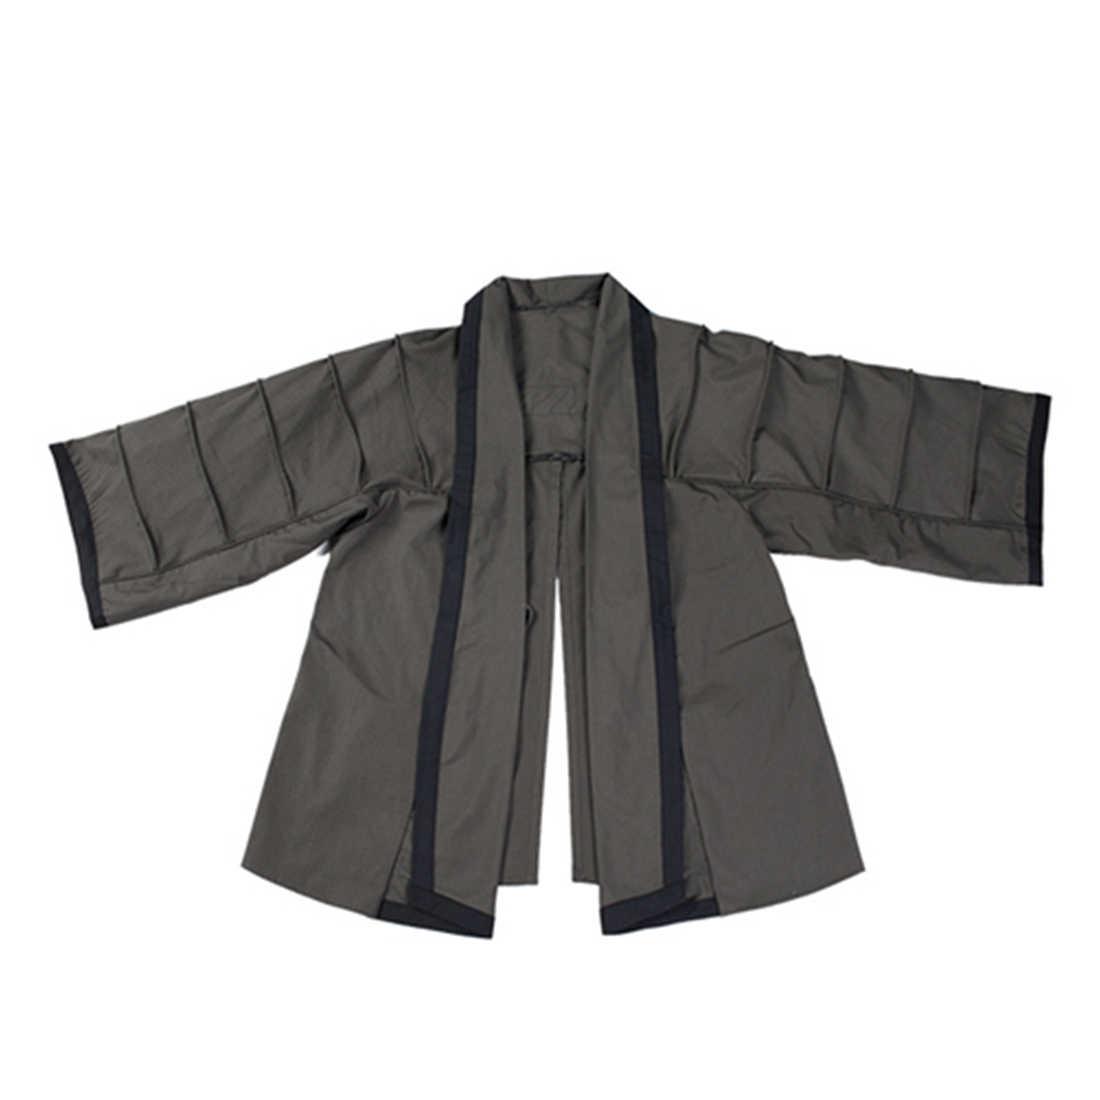 BACRAFT 야외 전술 코트 훈련 망토 전투 Haori Jacket - Smoke Green M